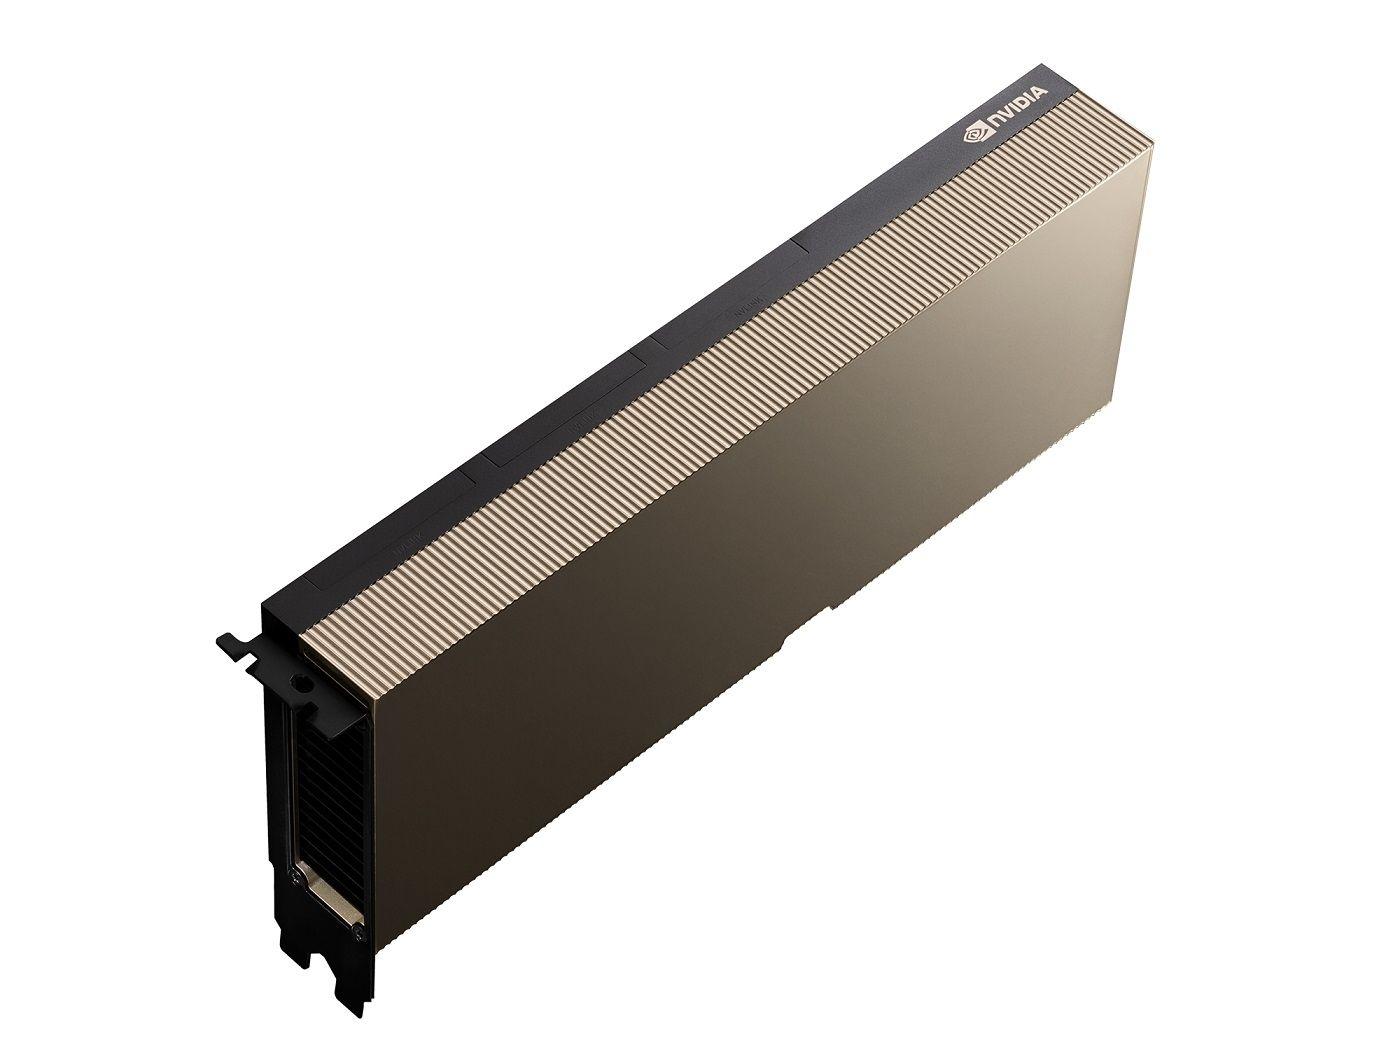 Nvidia A100 PCIe Ampere 04